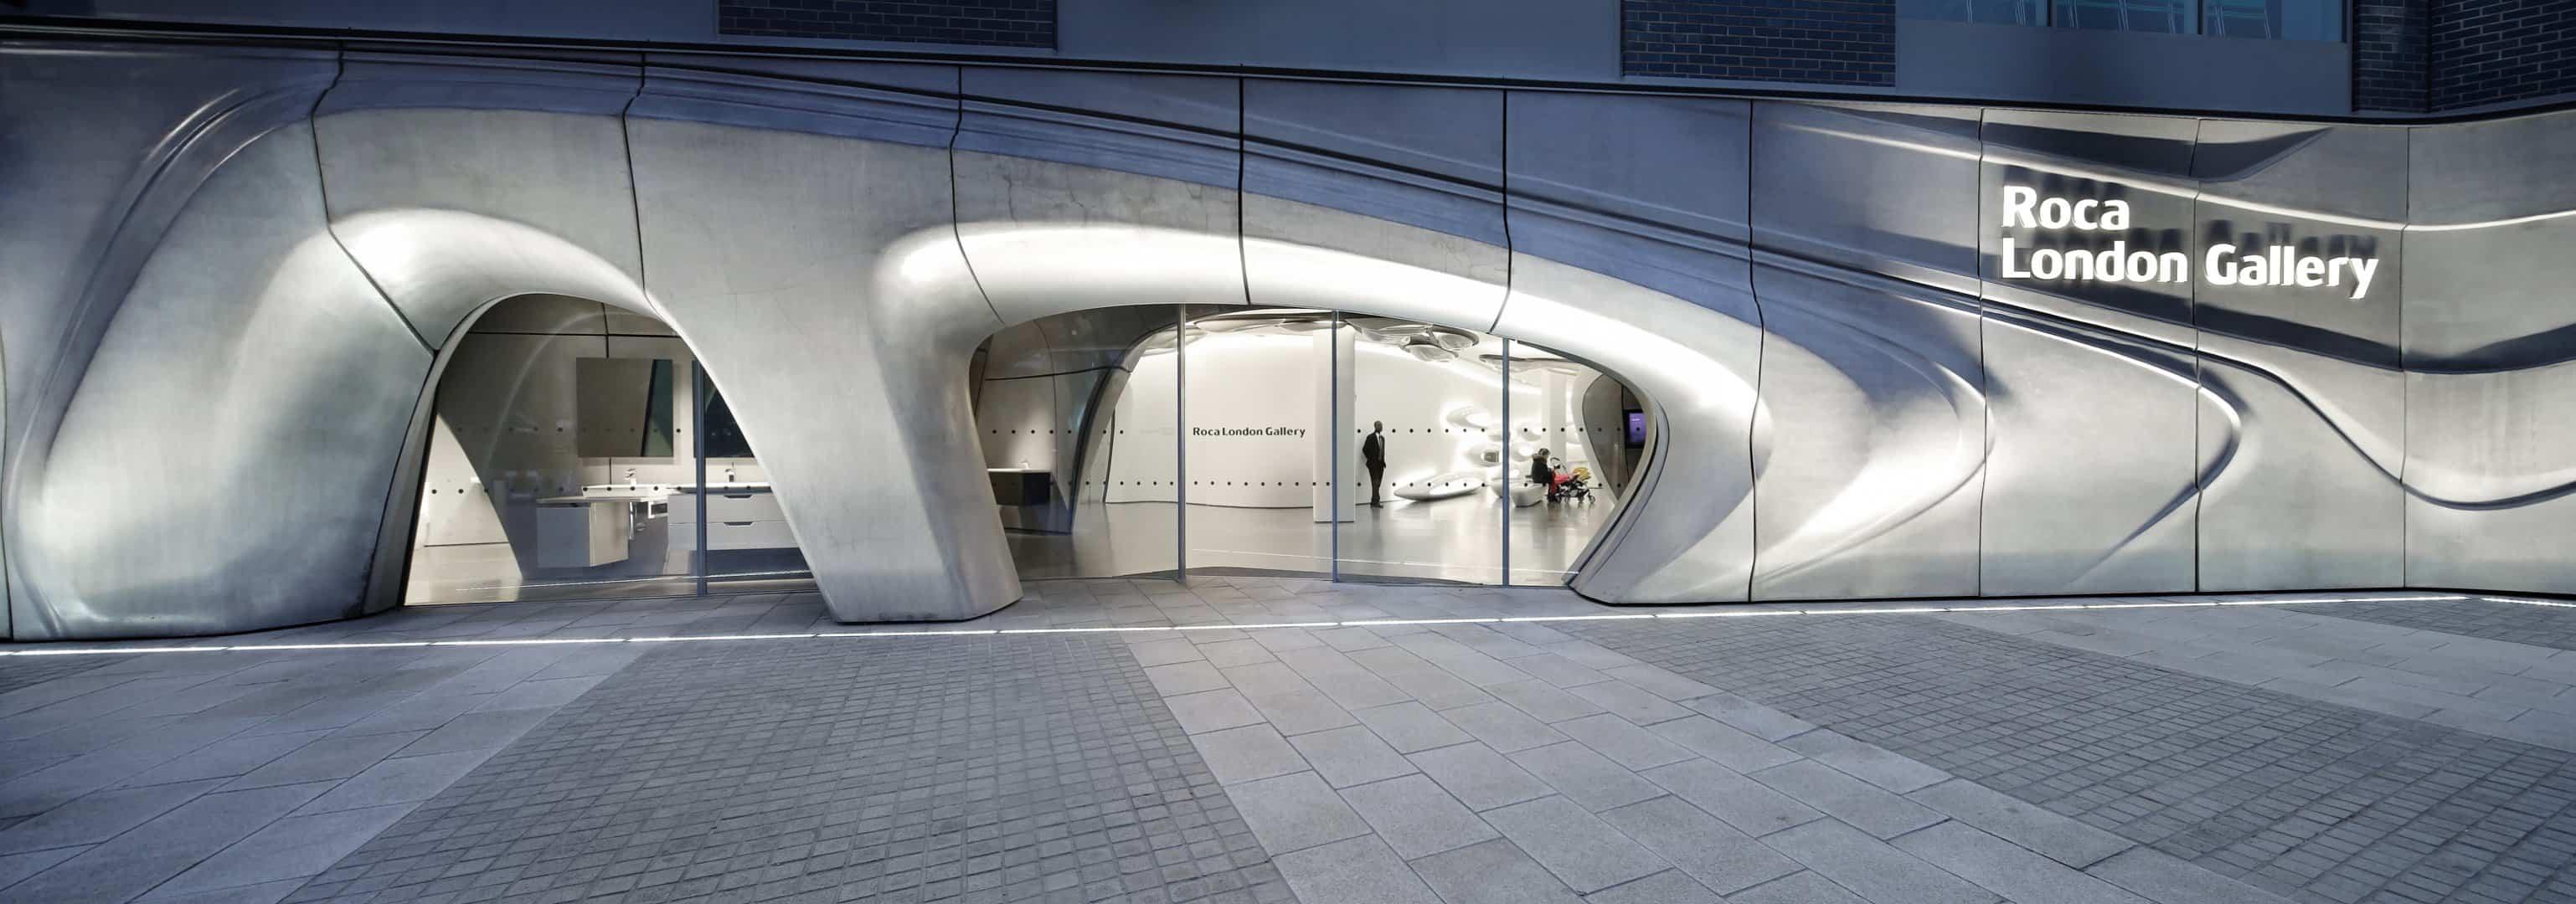 Zaha Hadid Product Design - the roca gallery london 016